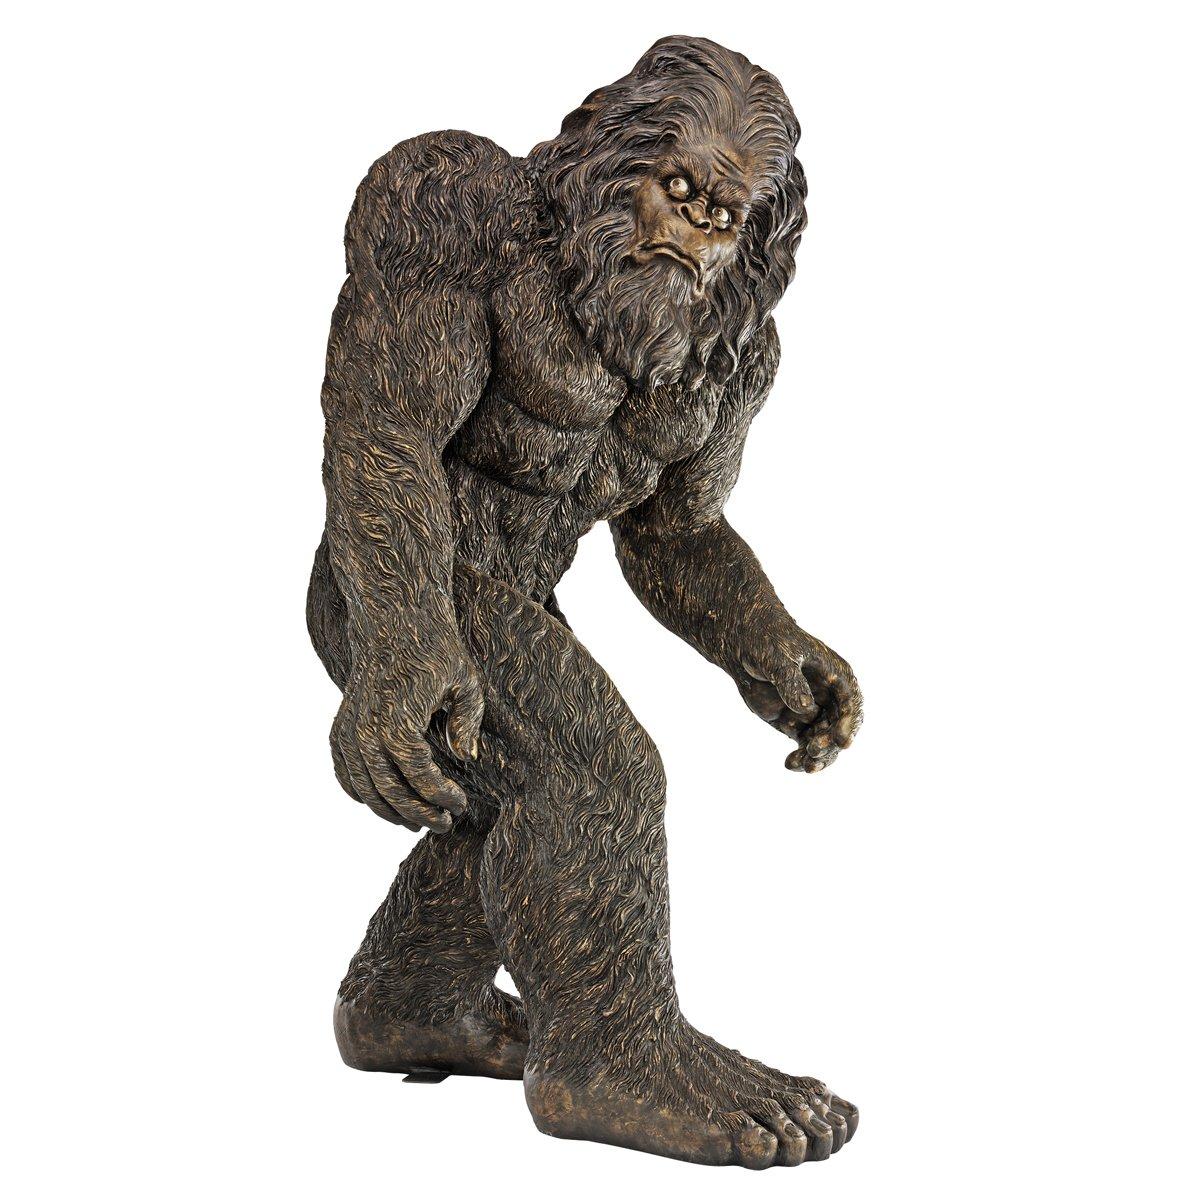 Amazon.com: Design Toscano Bigfoot The Holiday Yeti Holiday Ornament: Home  U0026 Kitchen